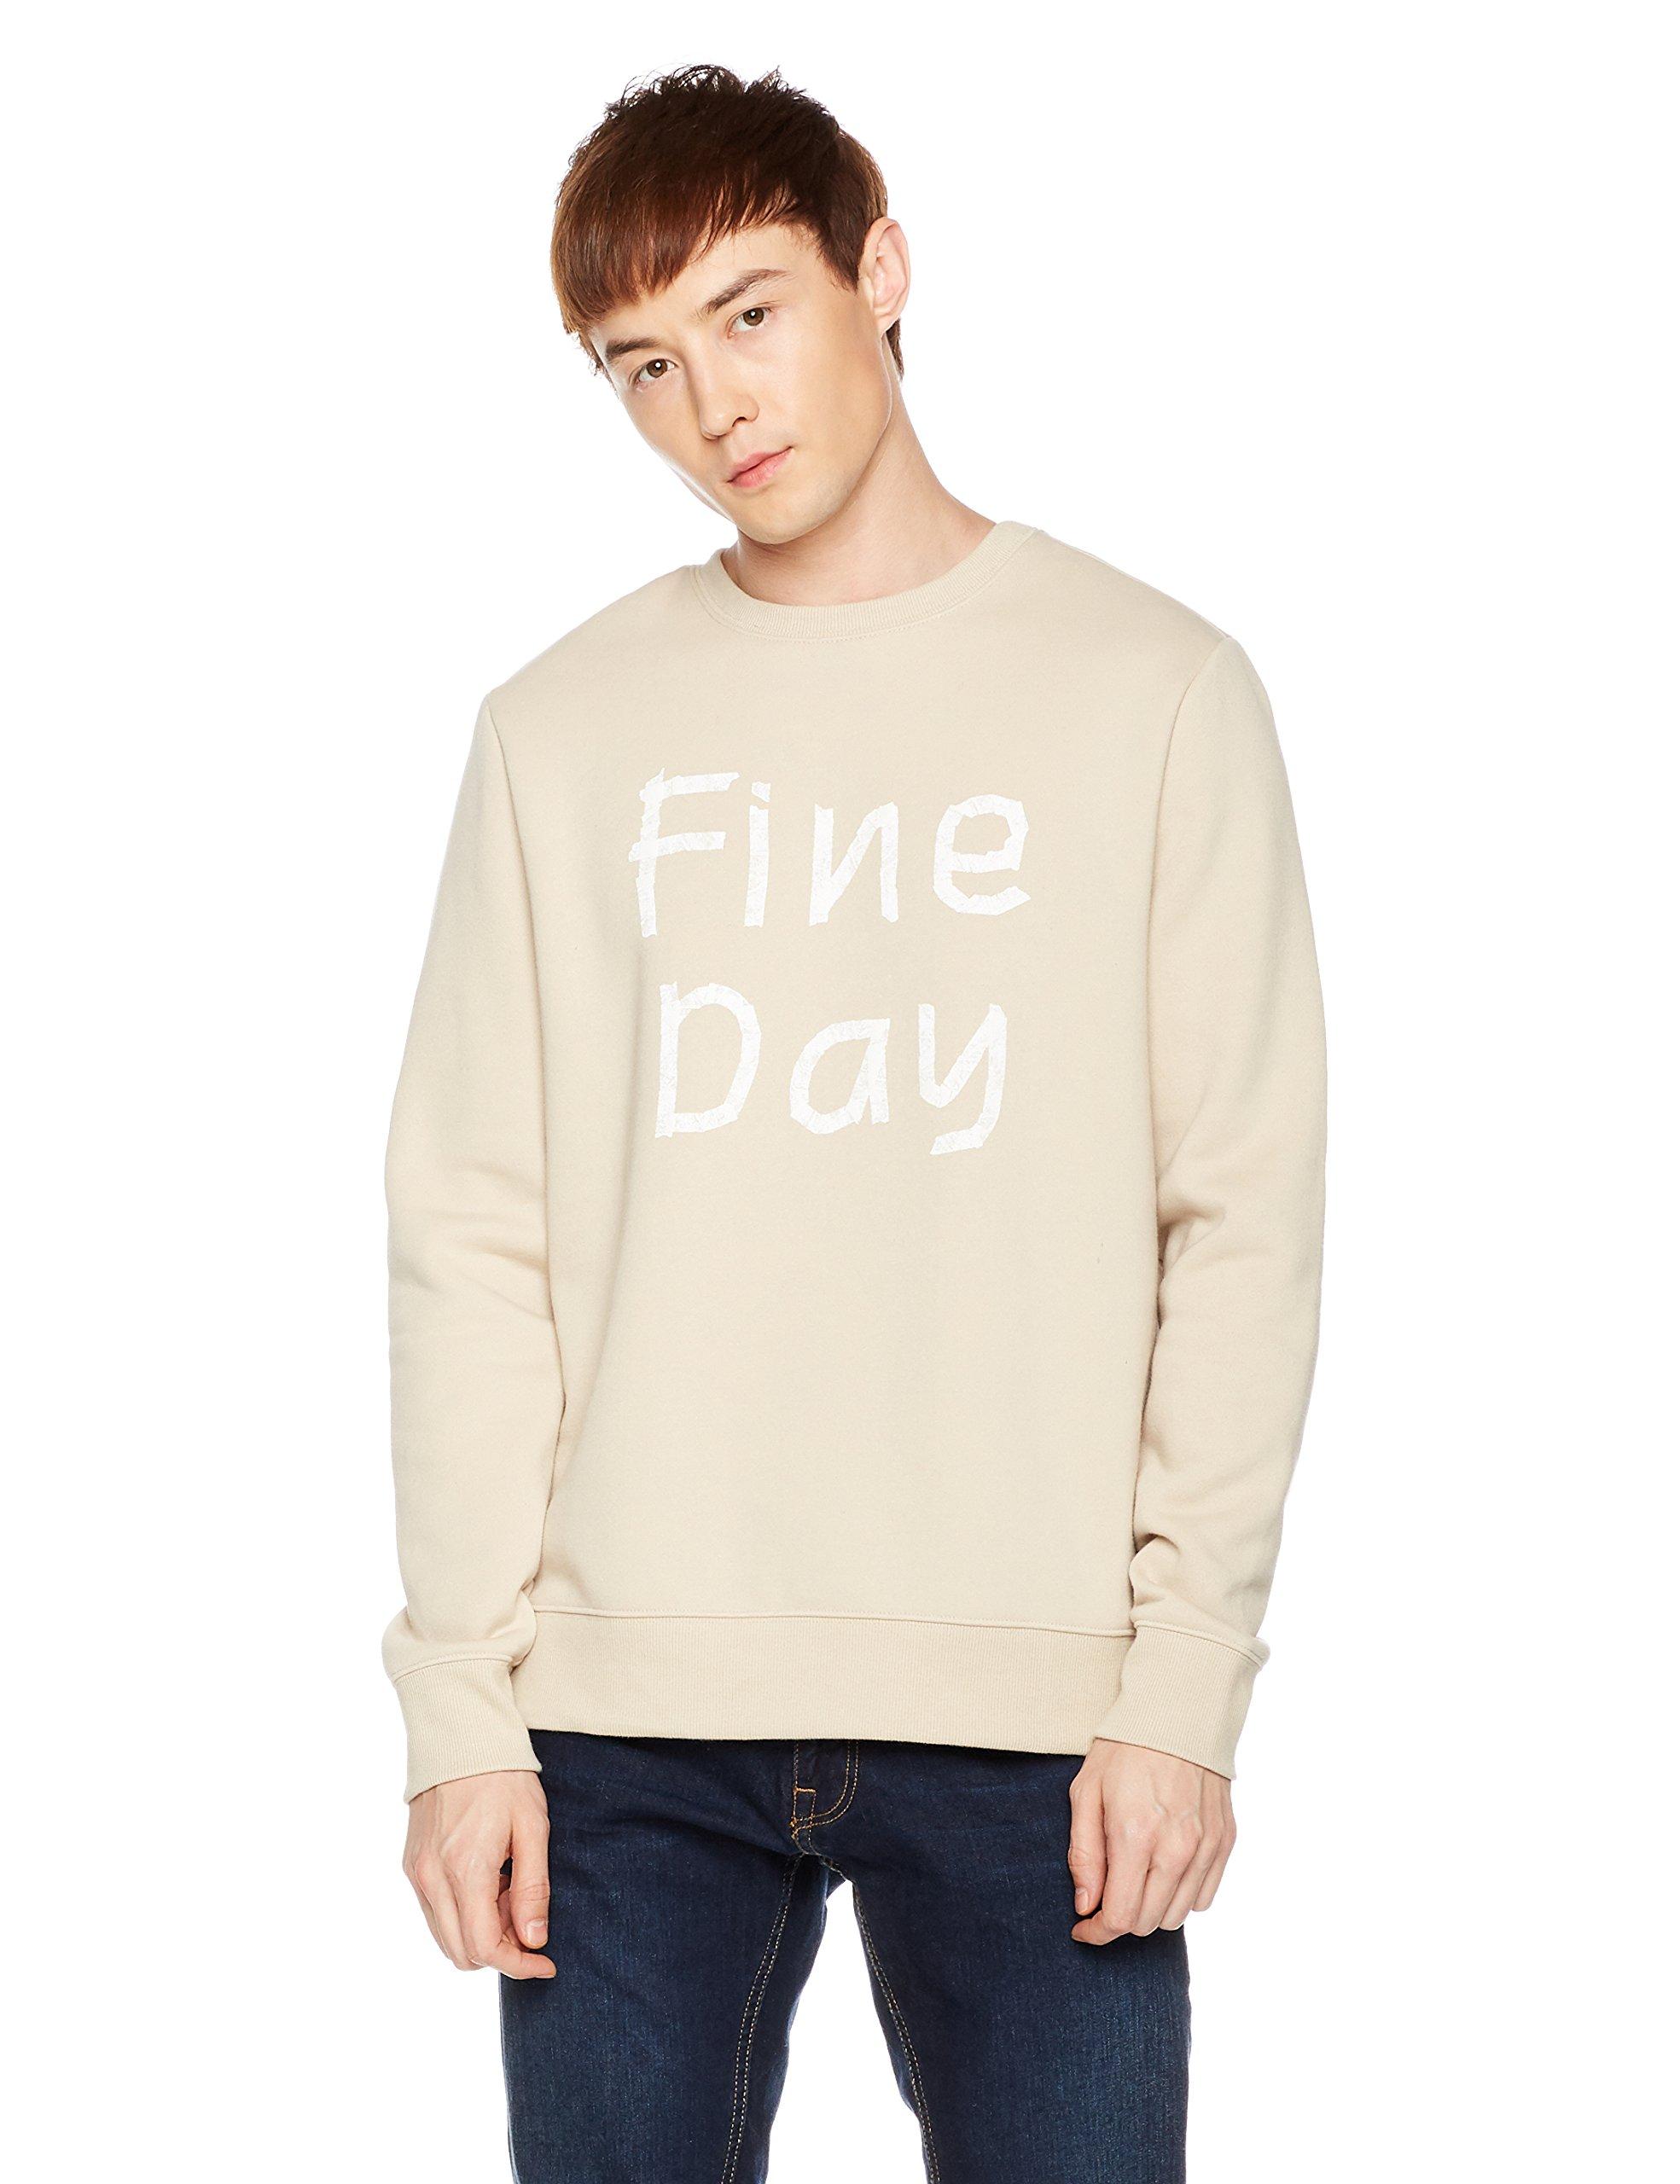 Something for Everyone Men's Fine Day Graphic Pullover Fleece Sweatshirt X-Large Peyote